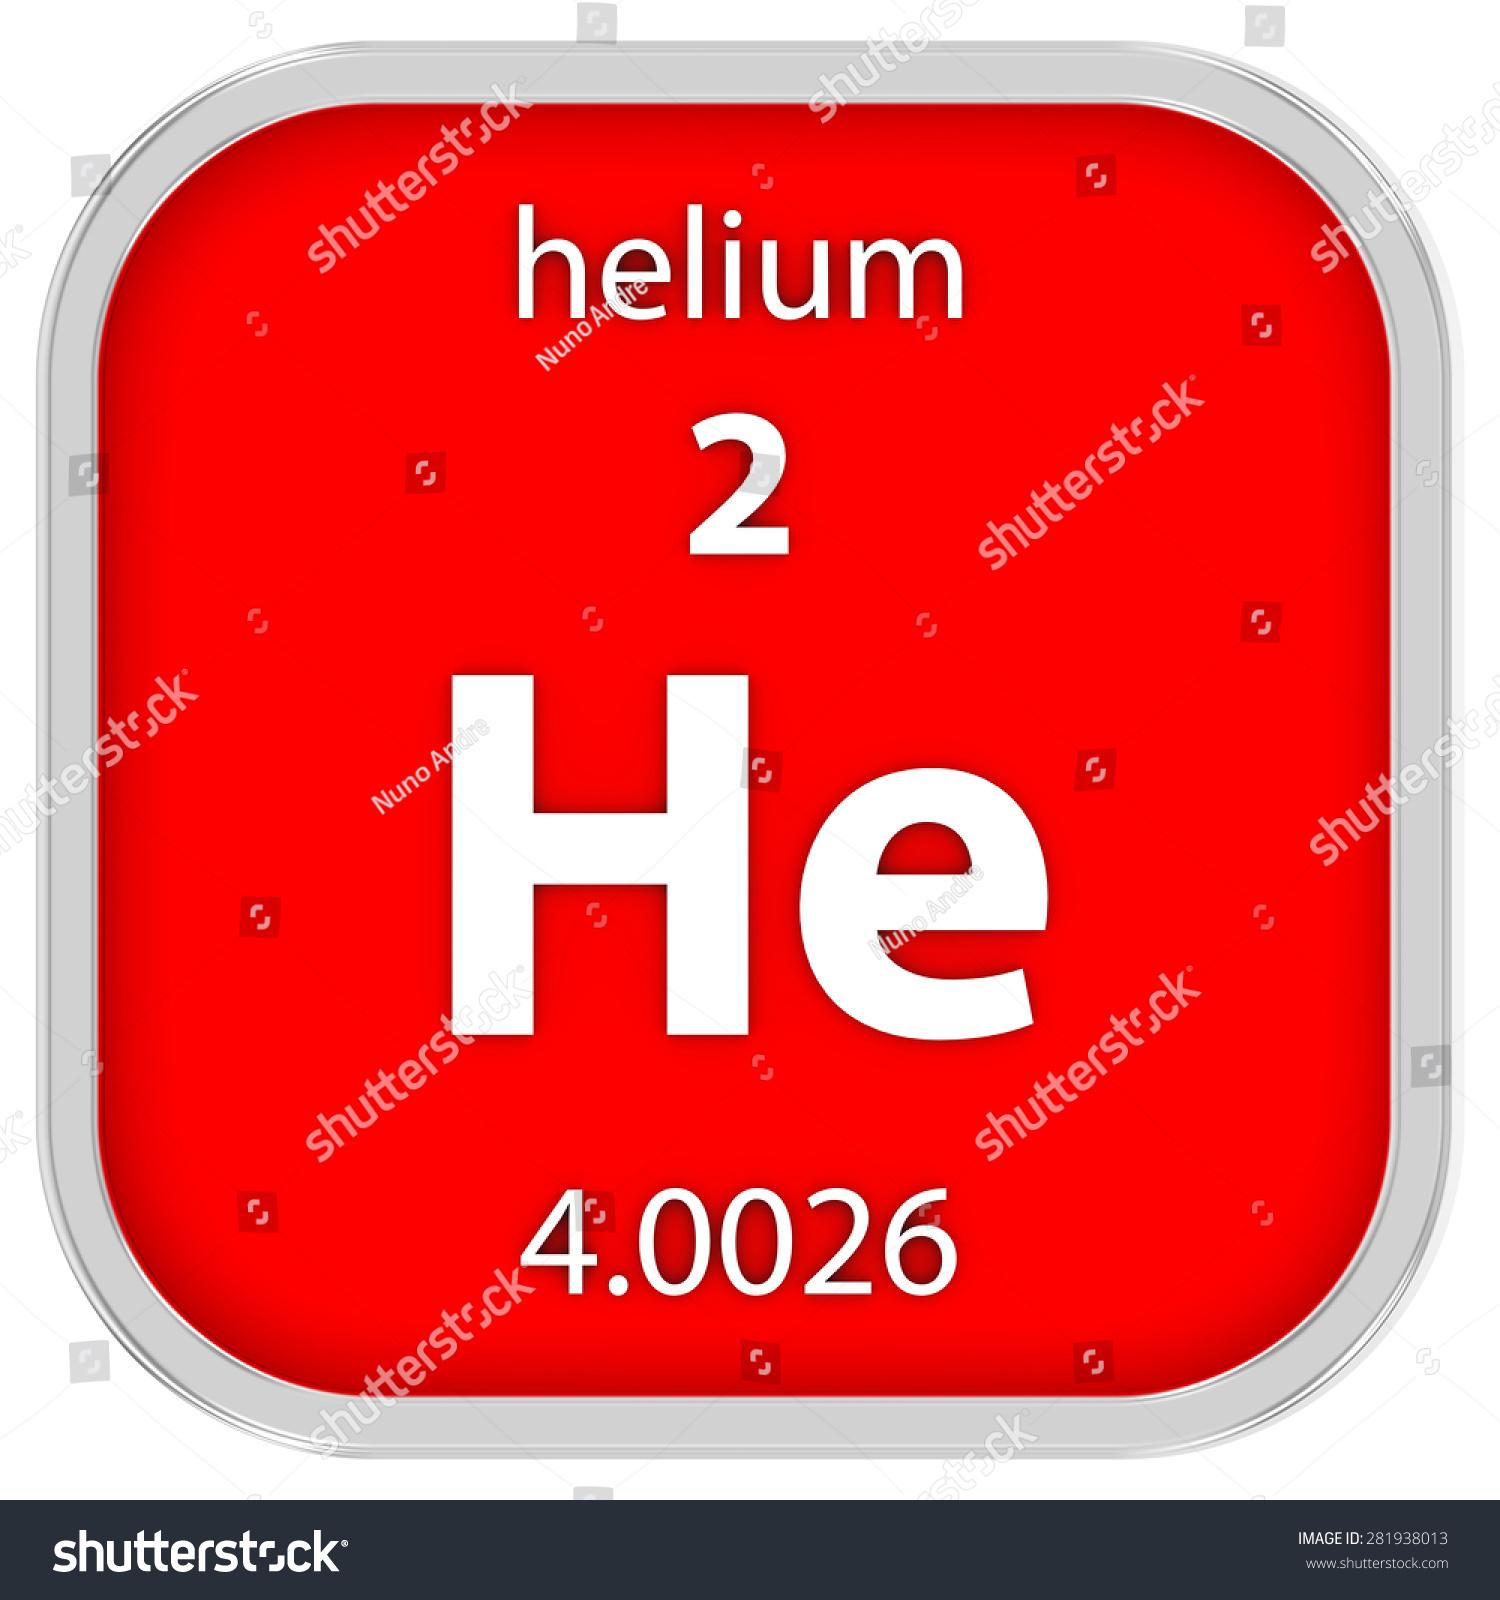 Helium periodic table images periodic table images helium symbol on periodic table choice image periodic table images what is the symbol for helium gamestrikefo Gallery